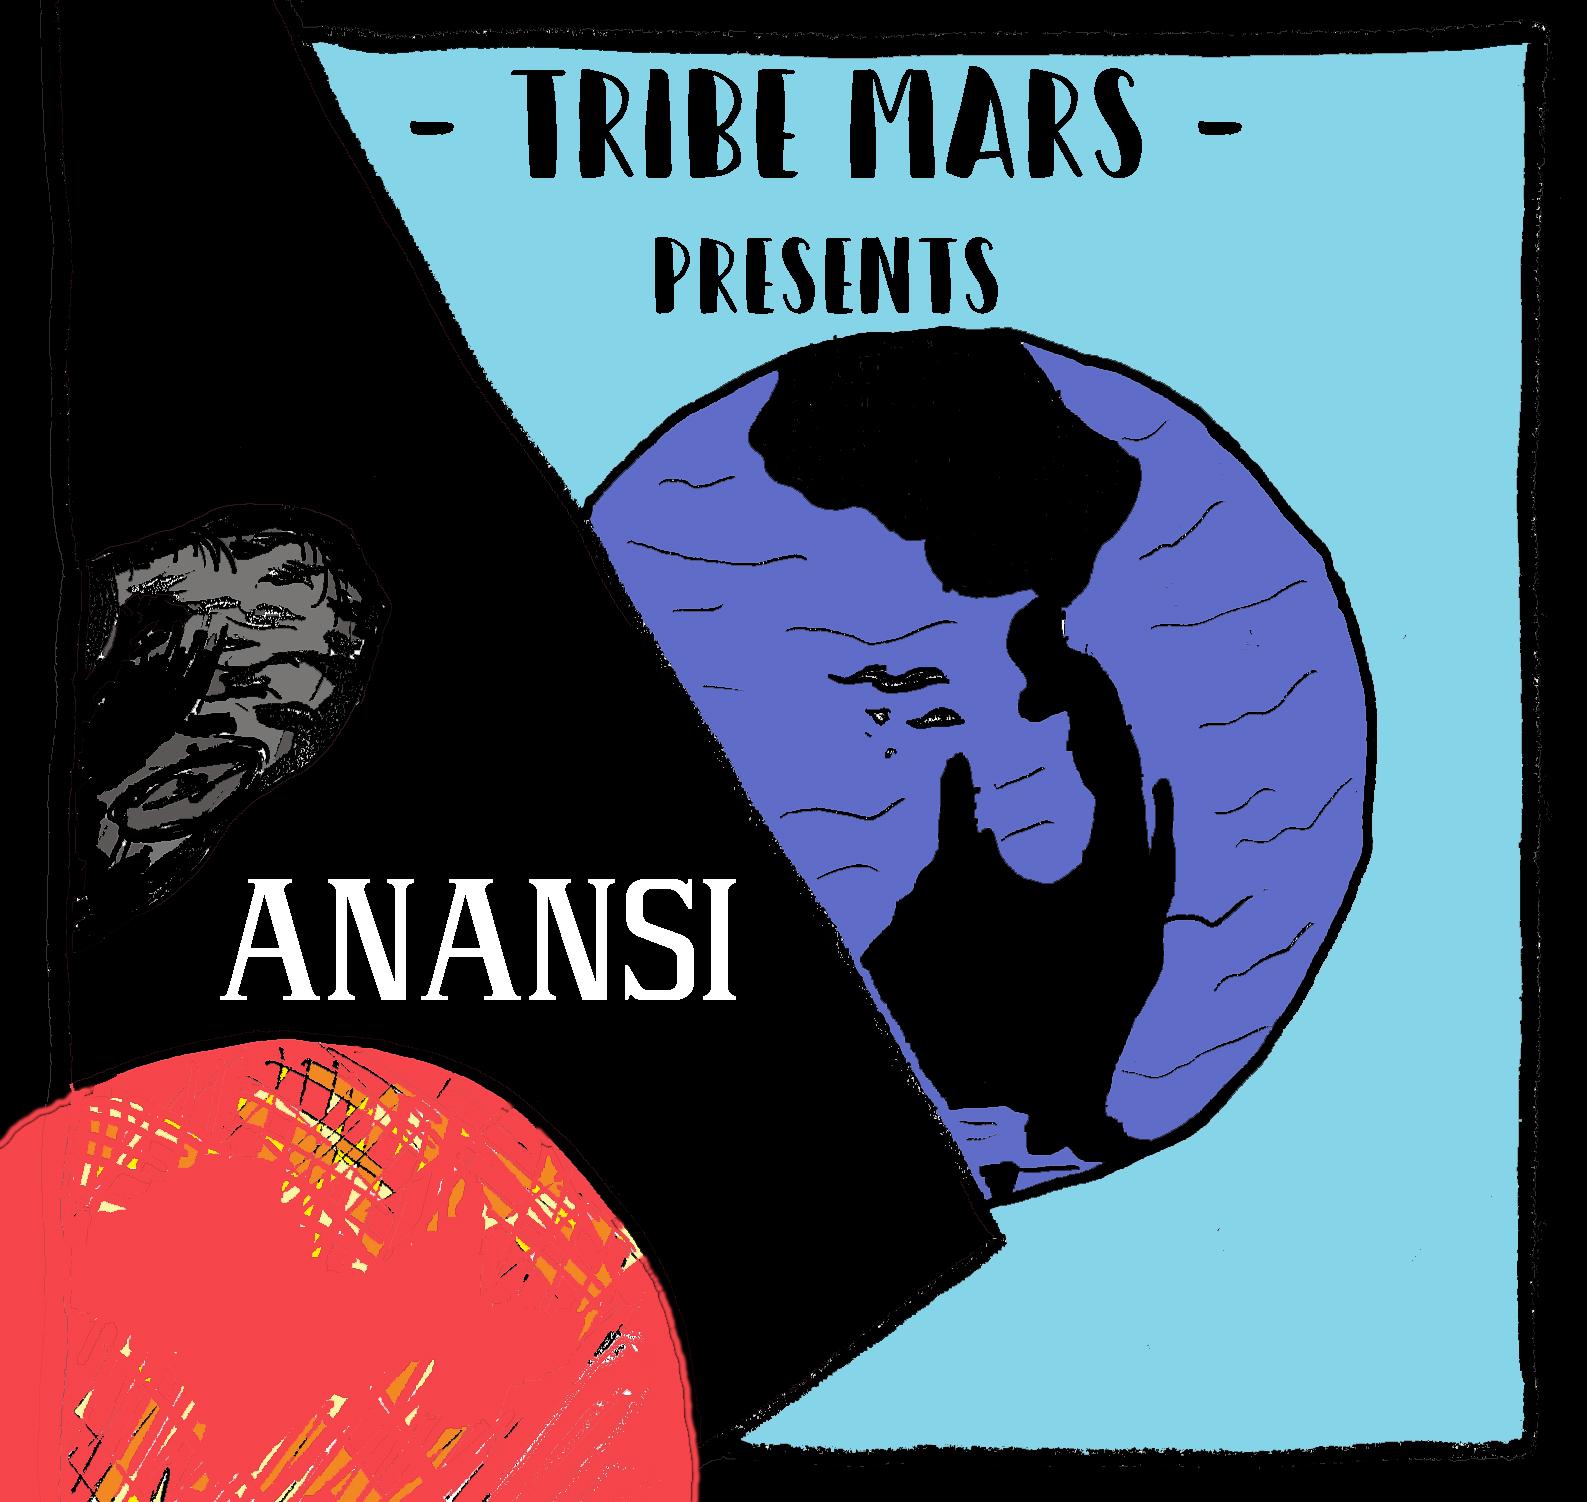 Anansi single cover